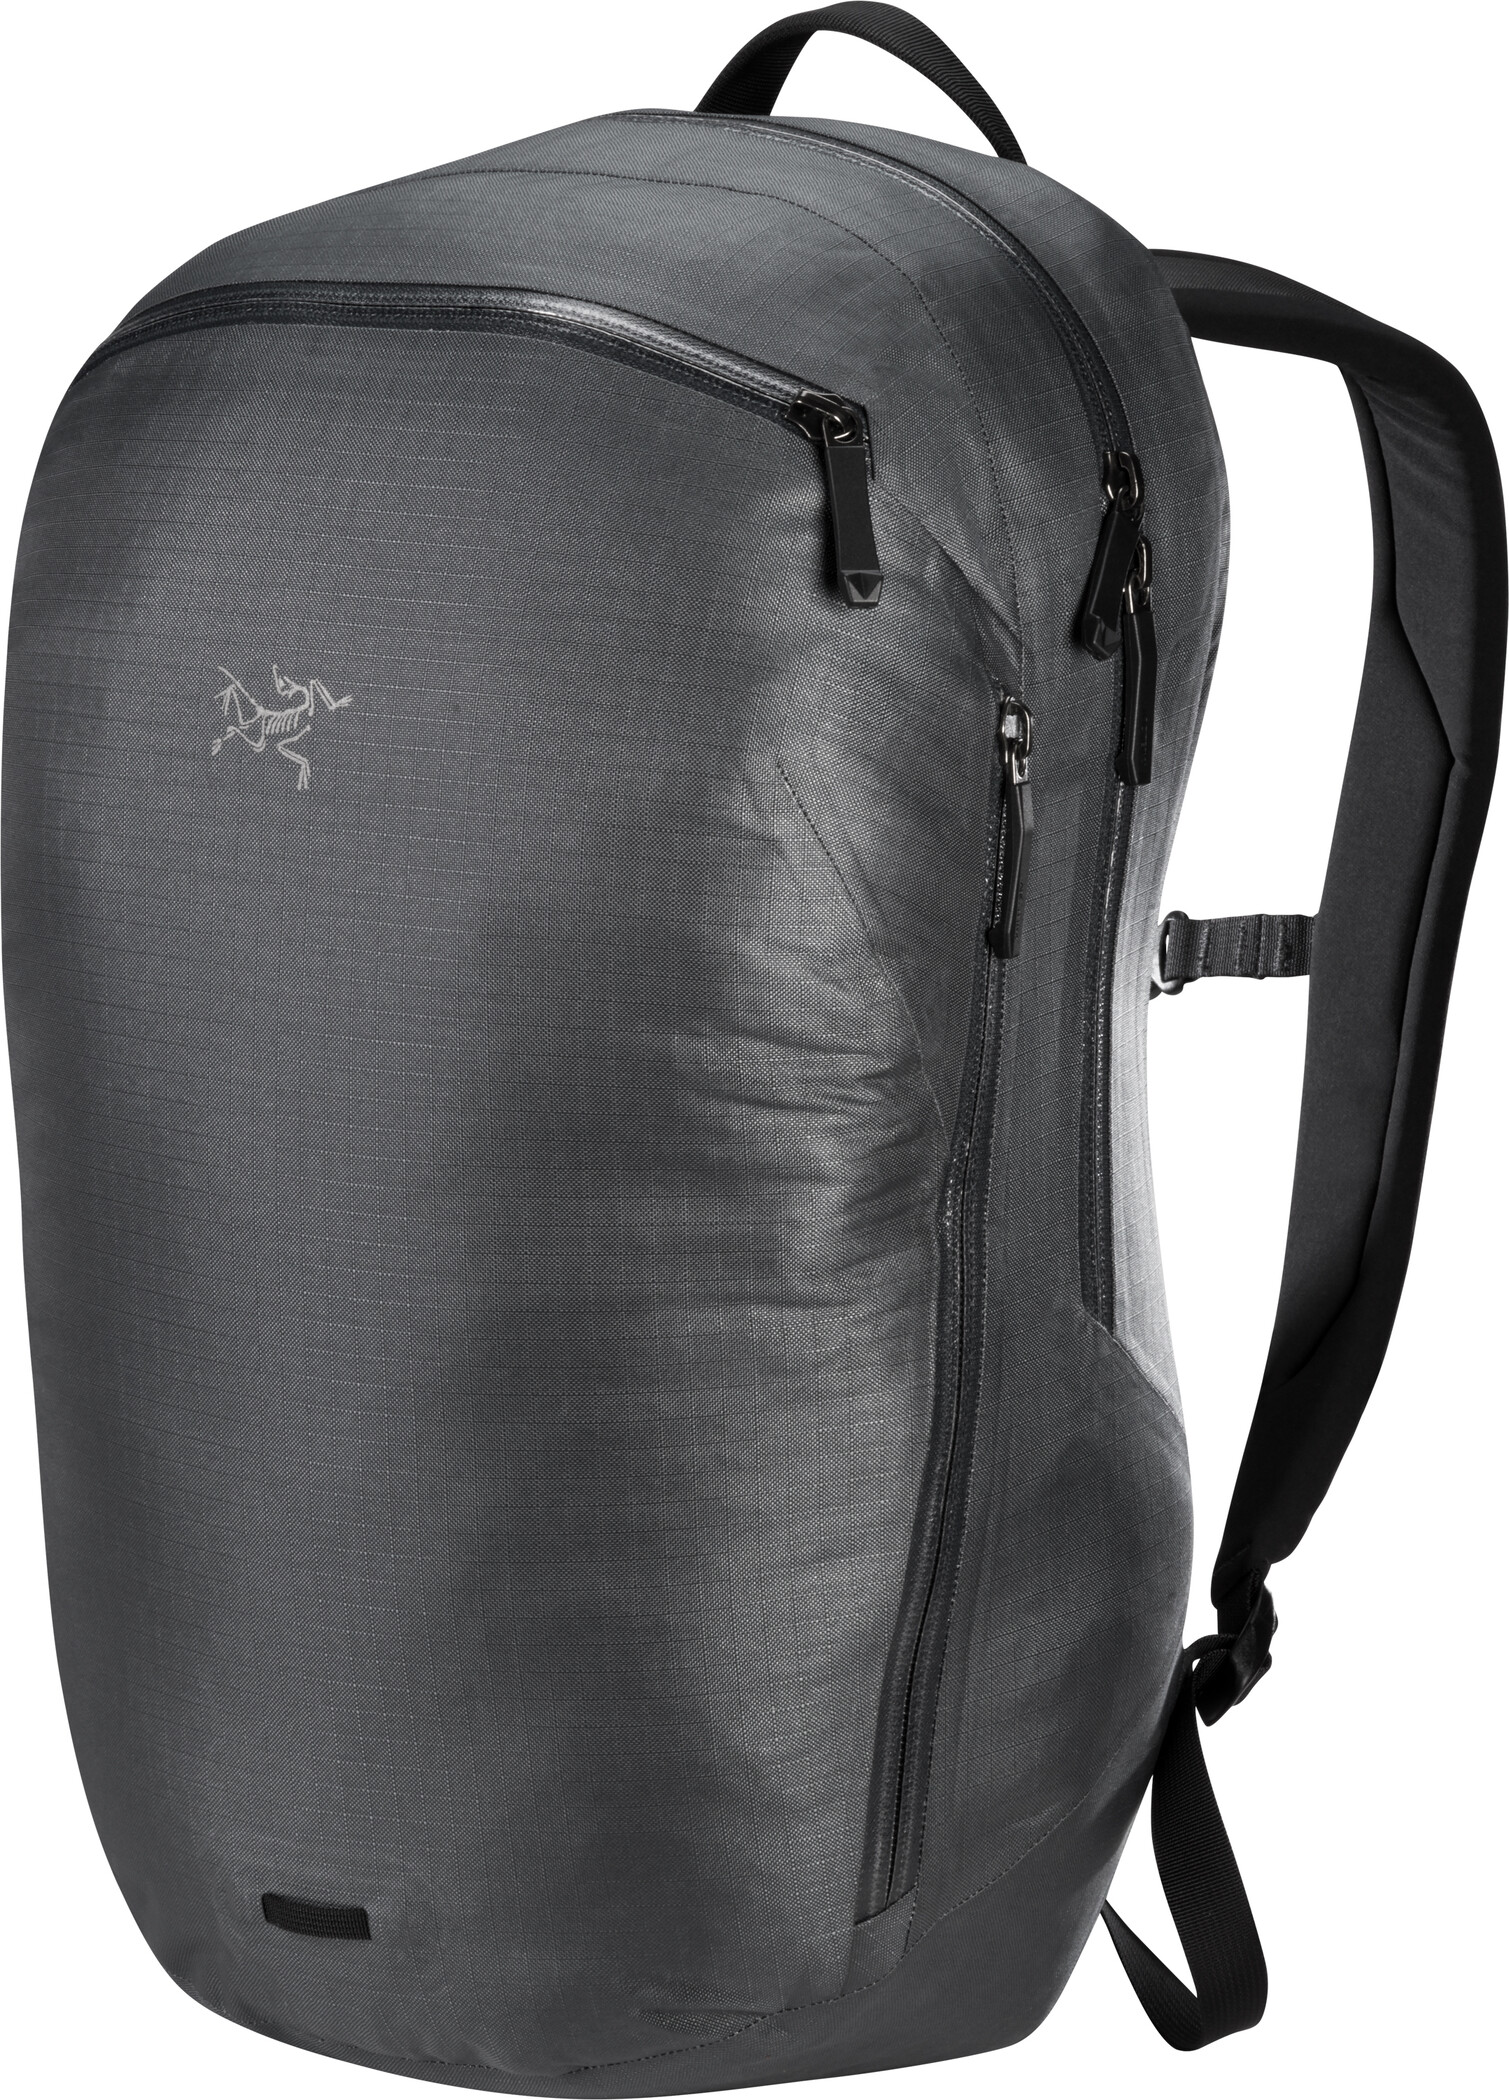 Arc'teryx Granville Zip 16 Rygsæk, pilot (2019)   Travel bags